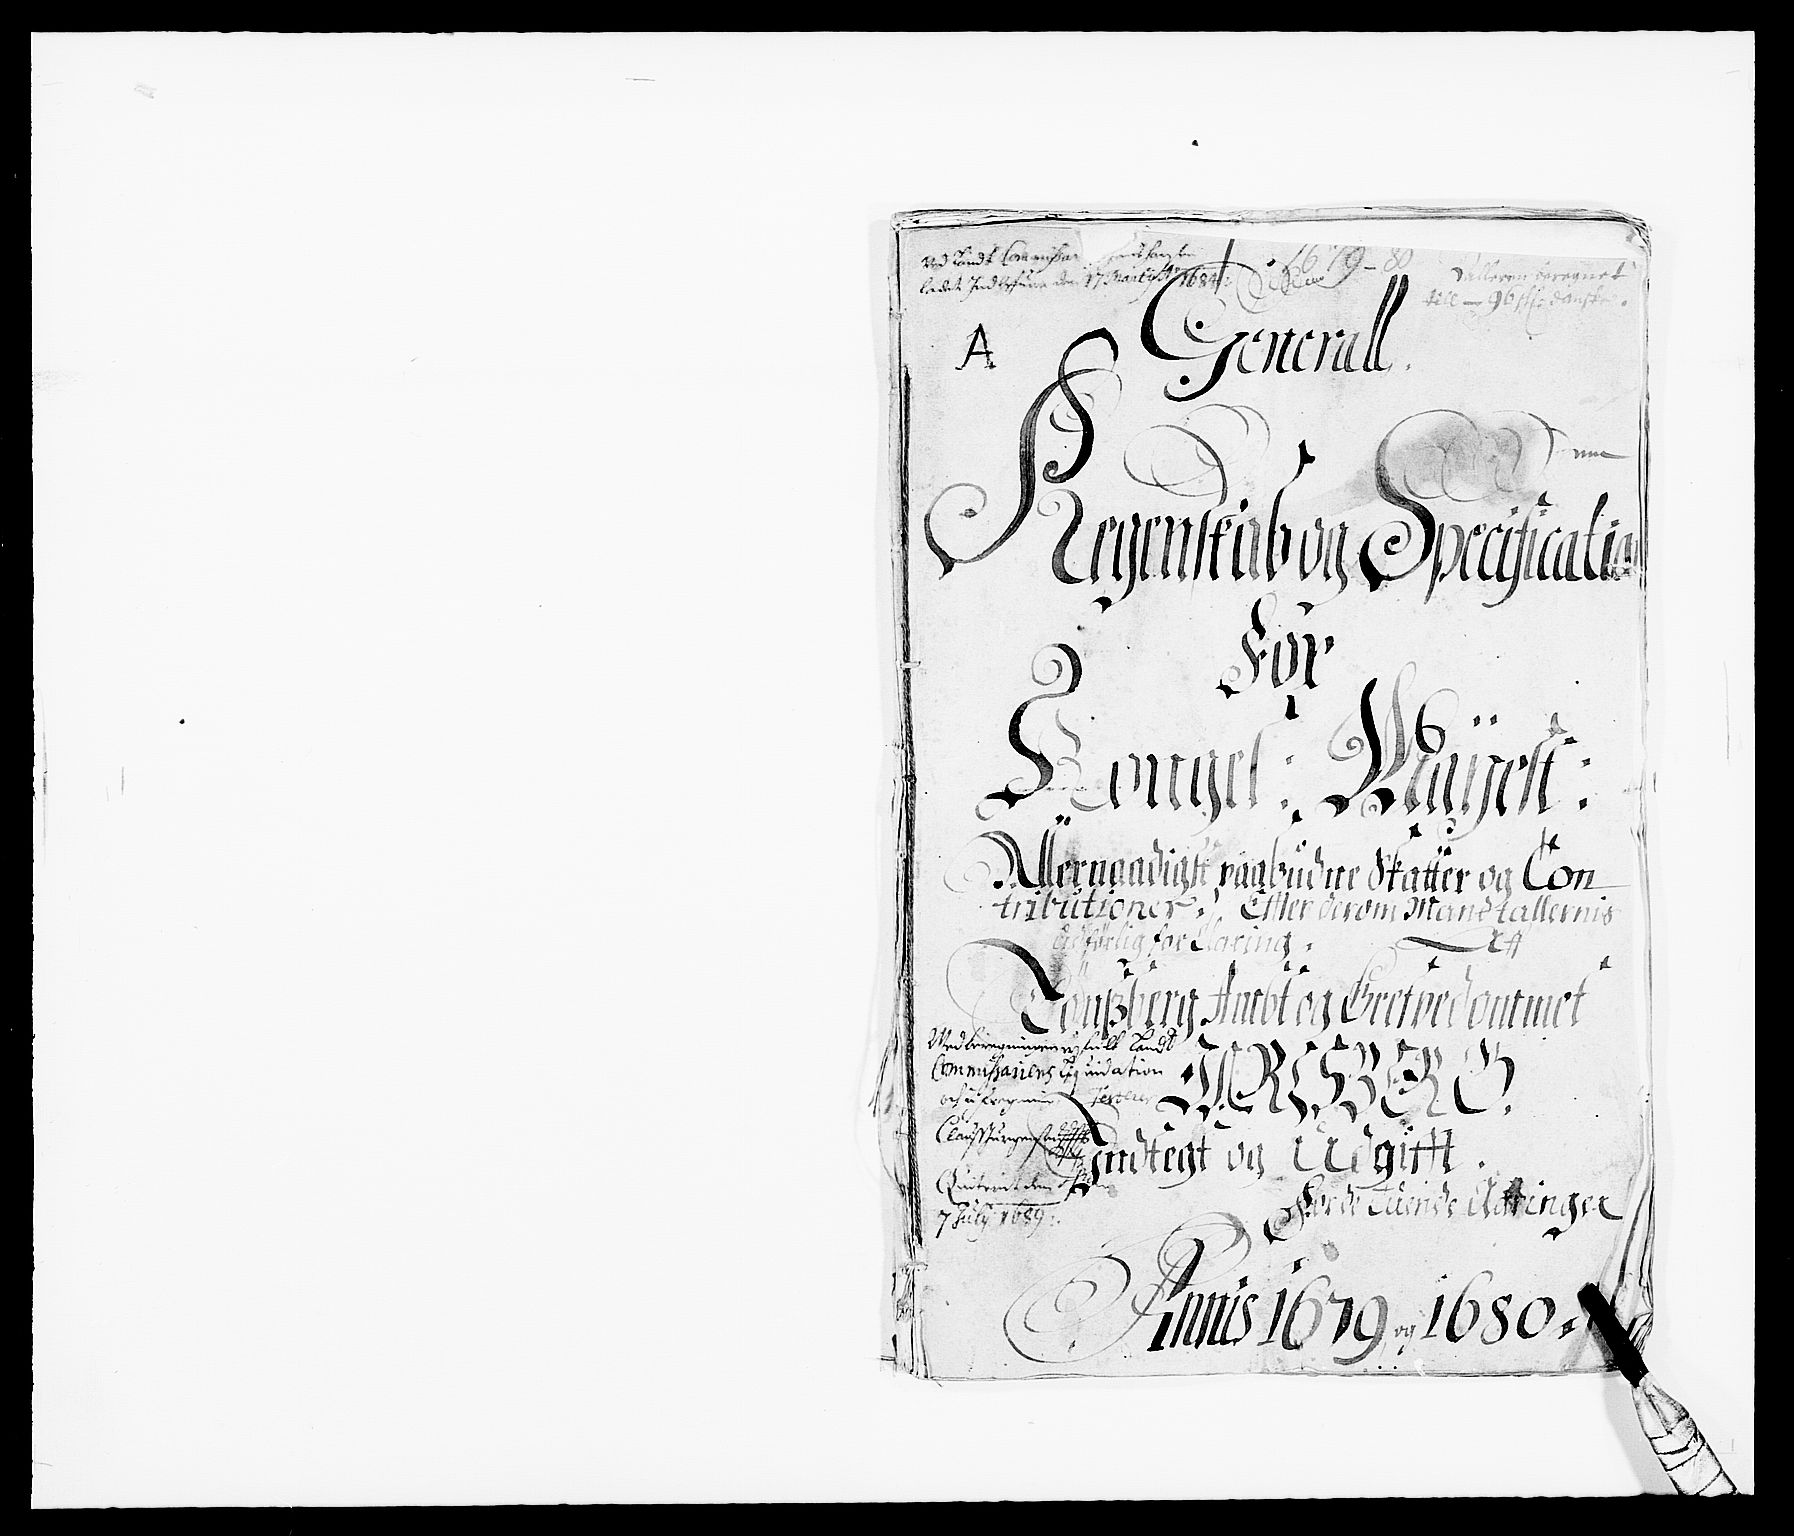 RA, Rentekammeret inntil 1814, Reviderte regnskaper, Fogderegnskap, R32/L1846: Fogderegnskap Jarlsberg grevskap, 1679-1680, s. 1